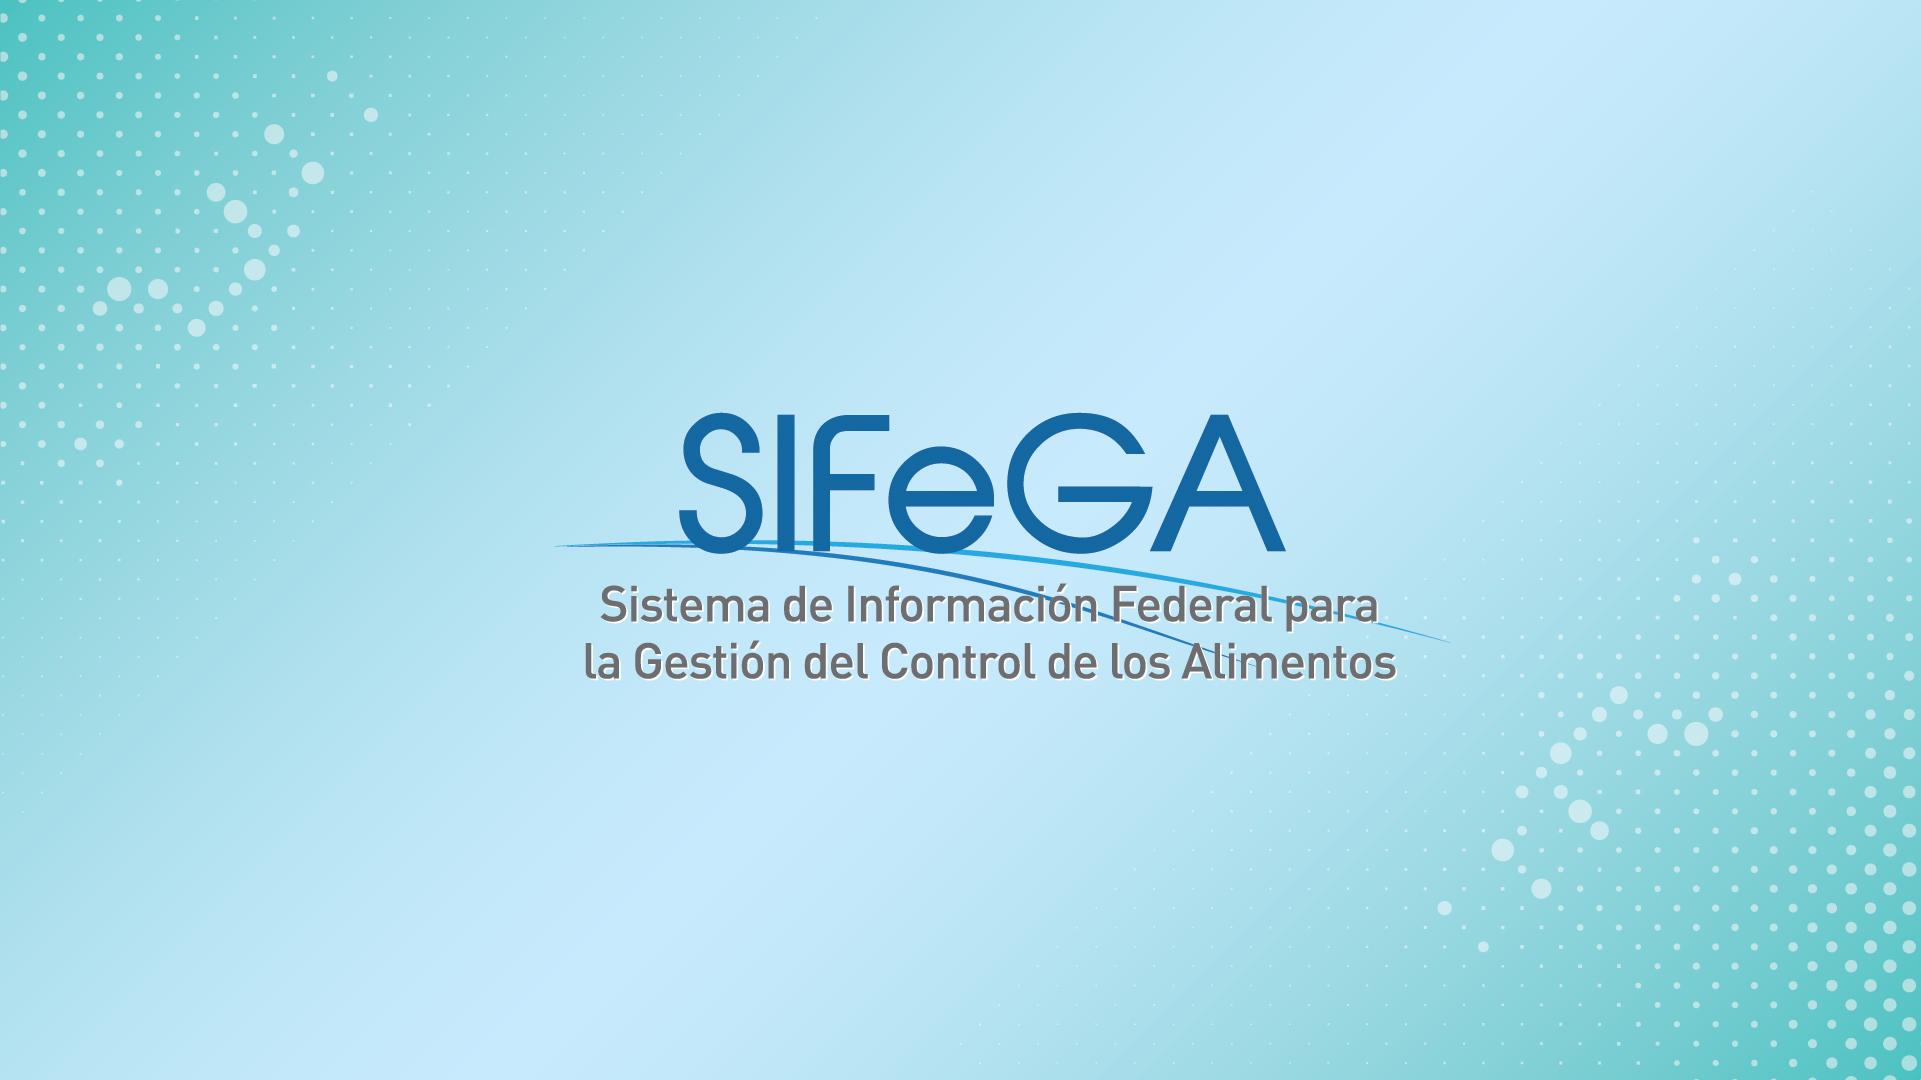 El SIFeGA se implementa en Mendoza | Argentina.gob.ar